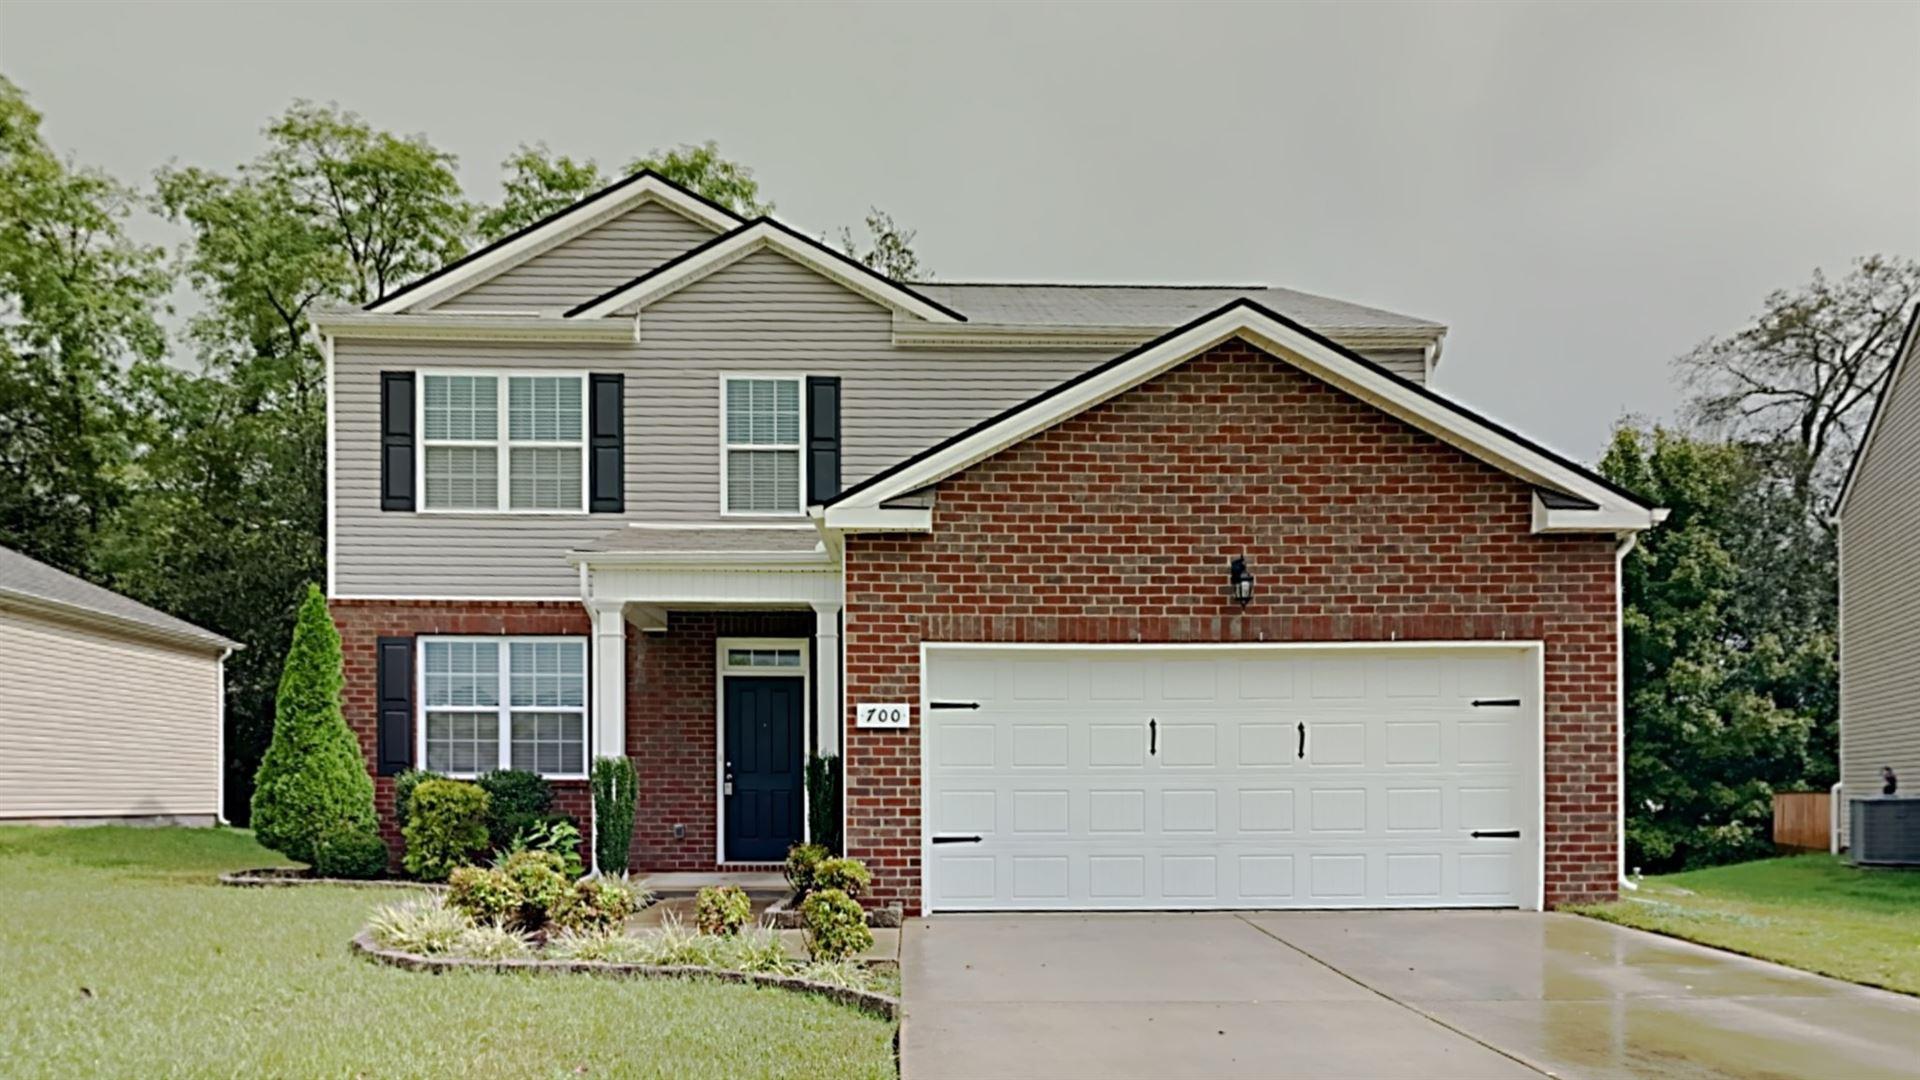 700 Prominence Rd, Columbia, TN 38401 - MLS#: 2293127